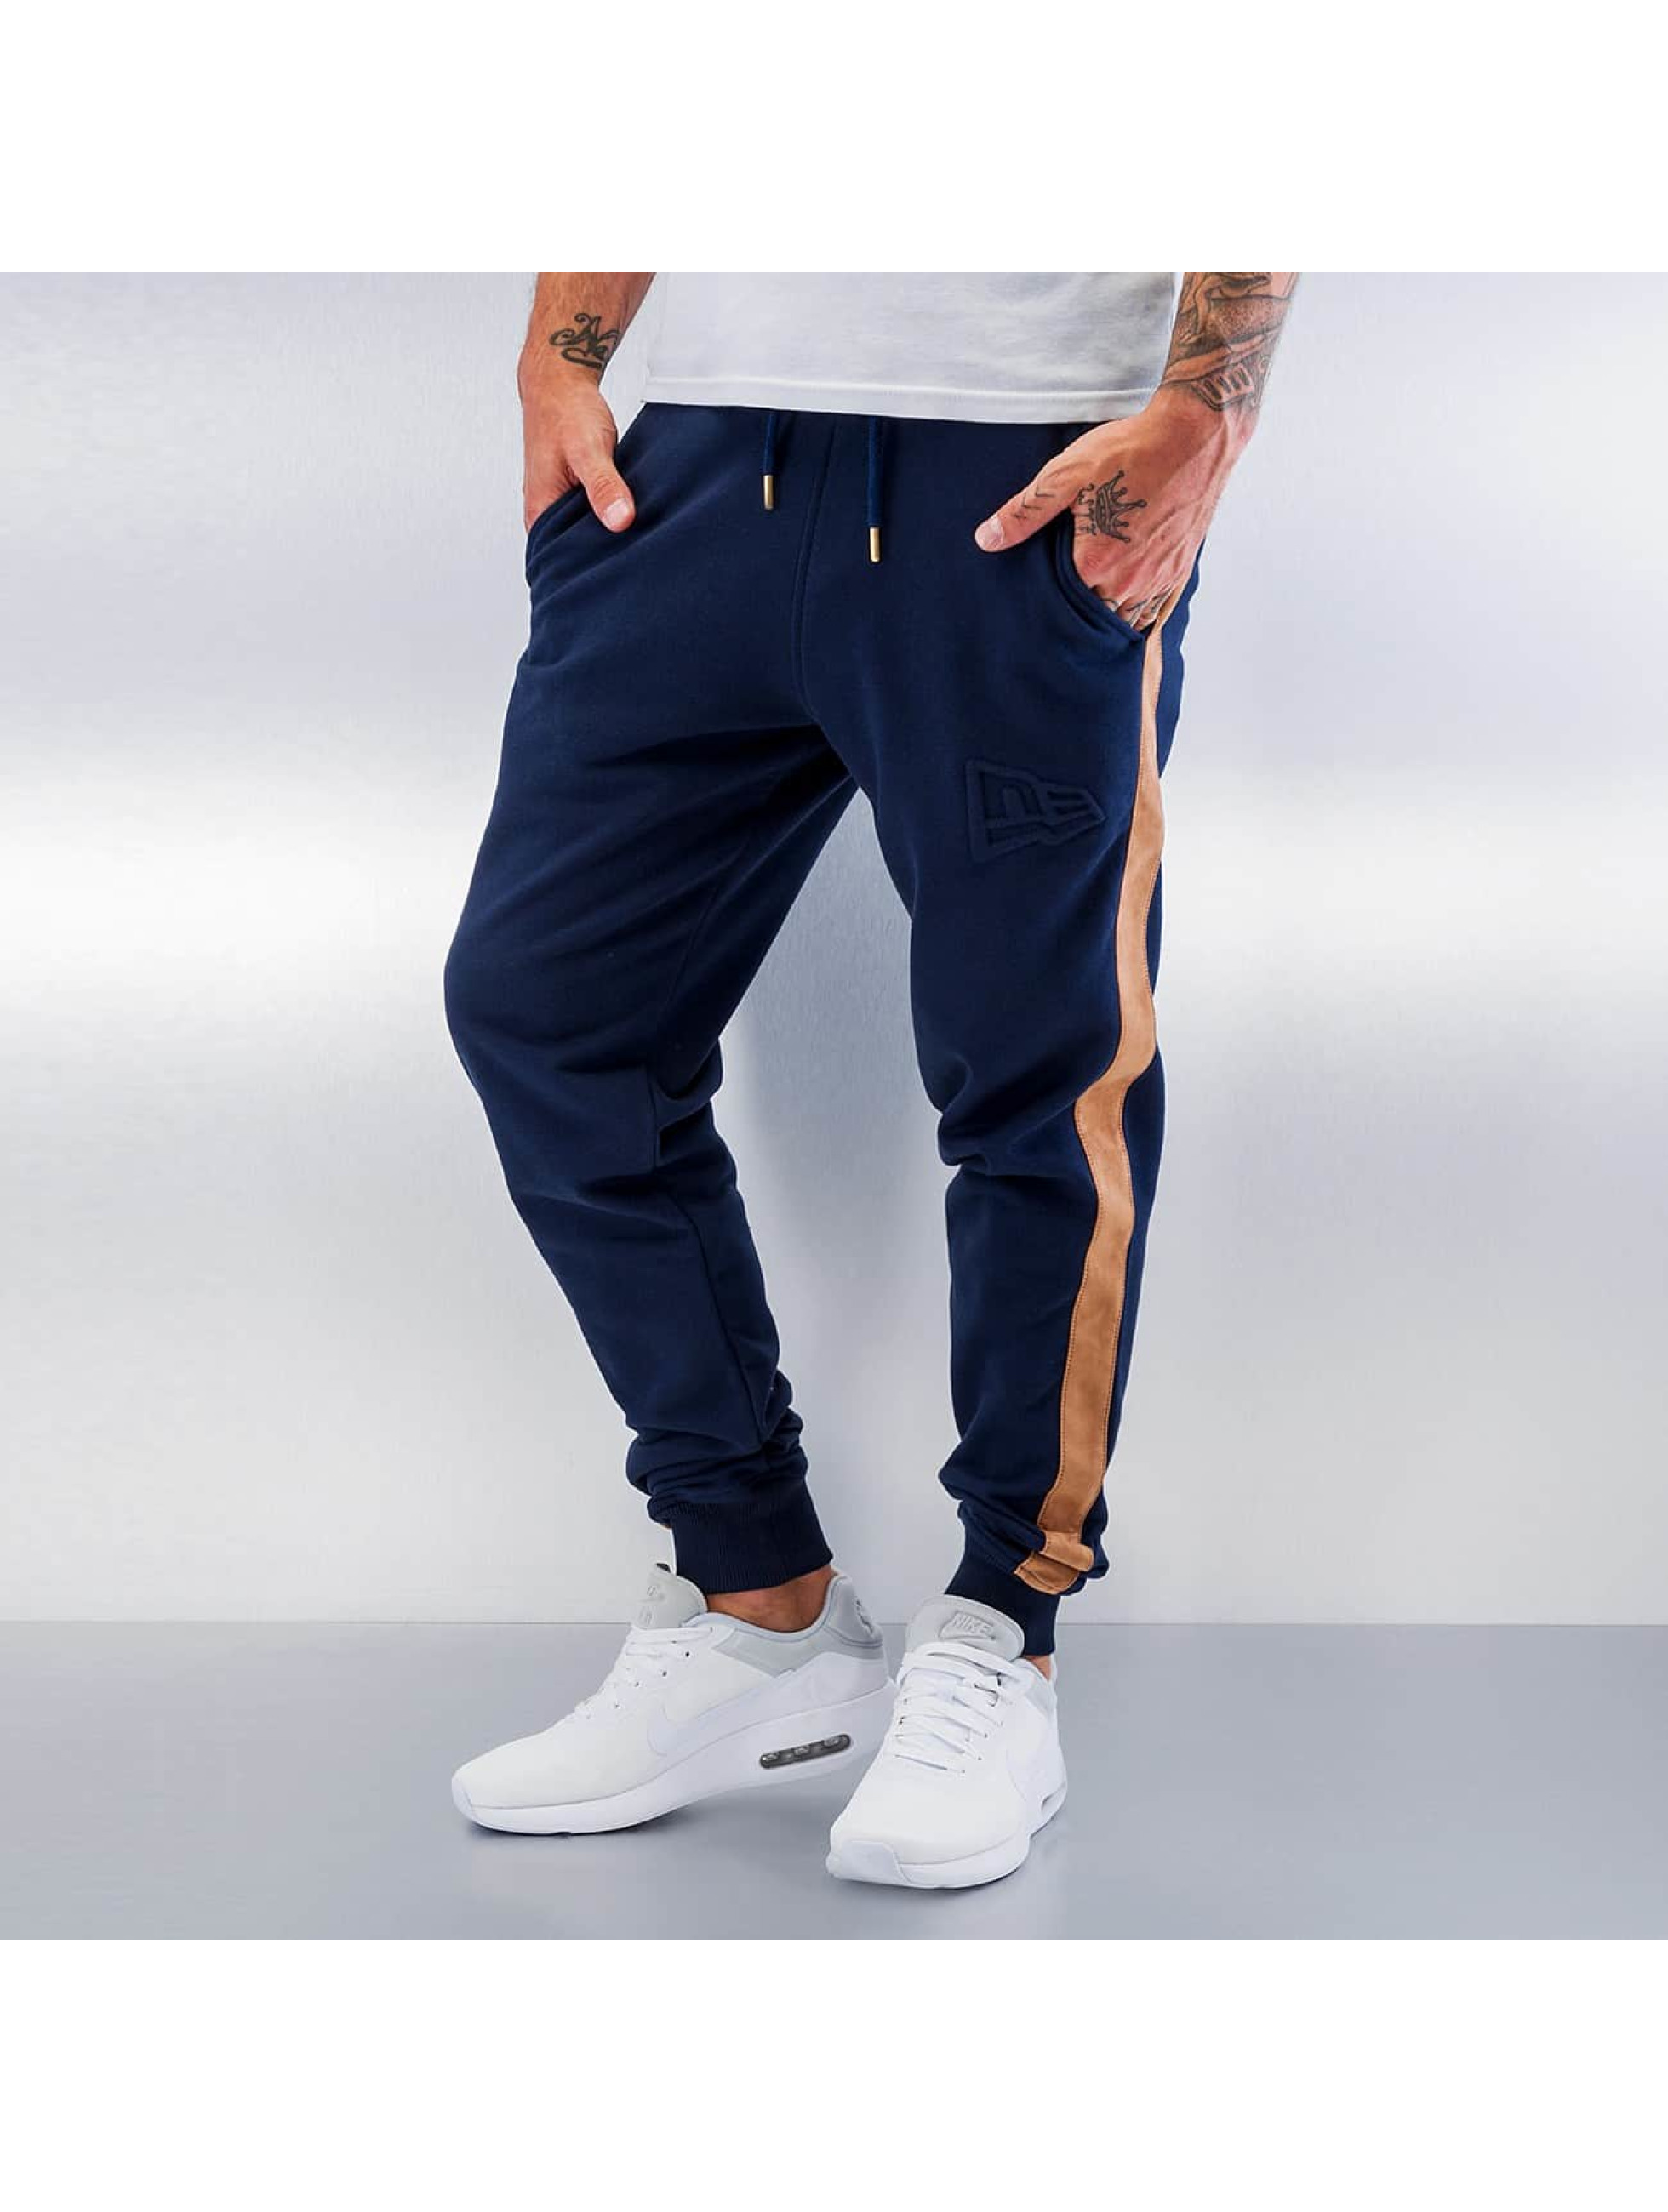 New Era Männer Jogginghose Crafted in blau